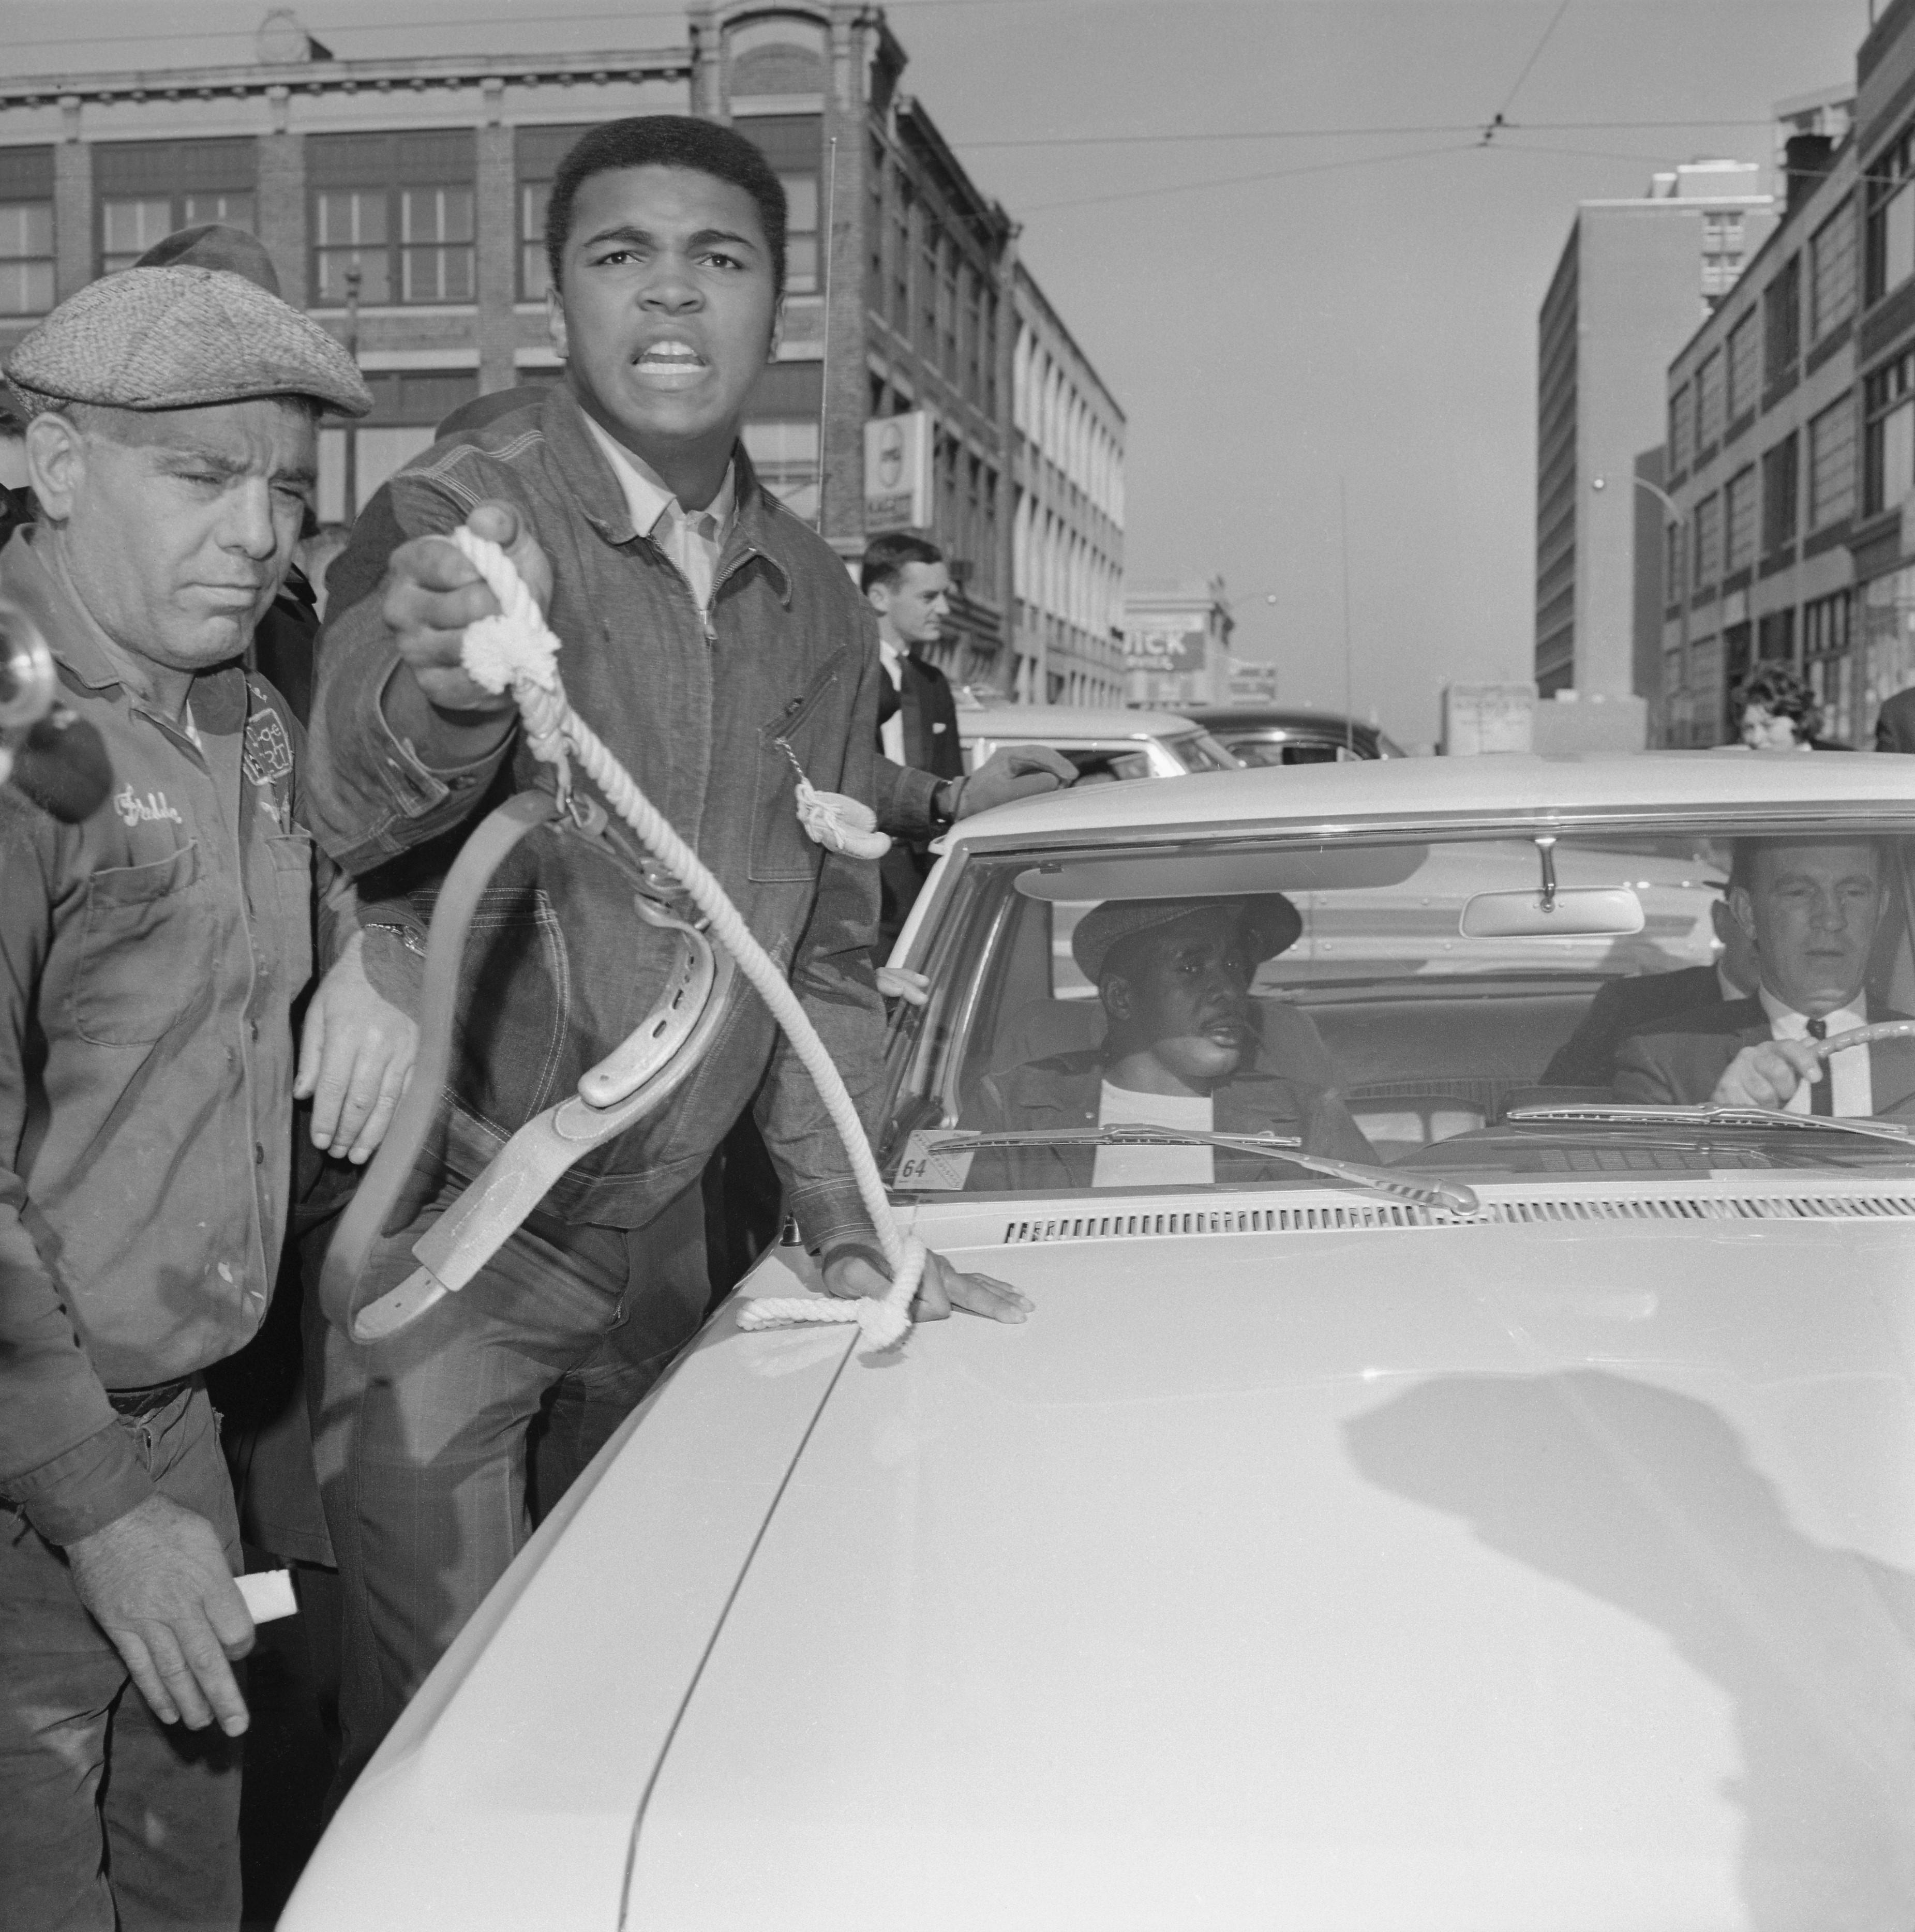 Ali devant la voiture de Liston